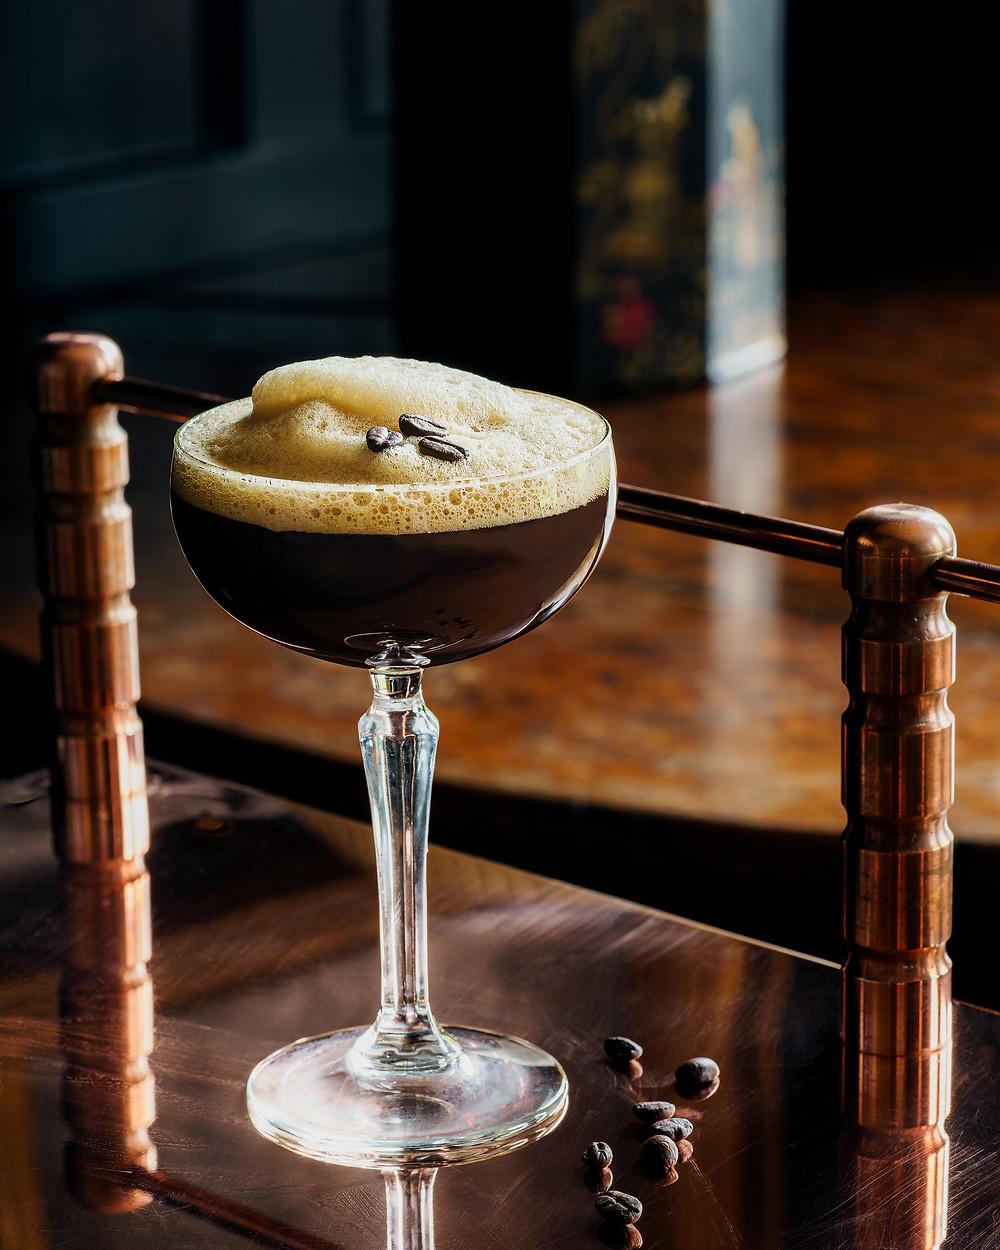 Espresso martini | DIY Cocktails to make during lockdown